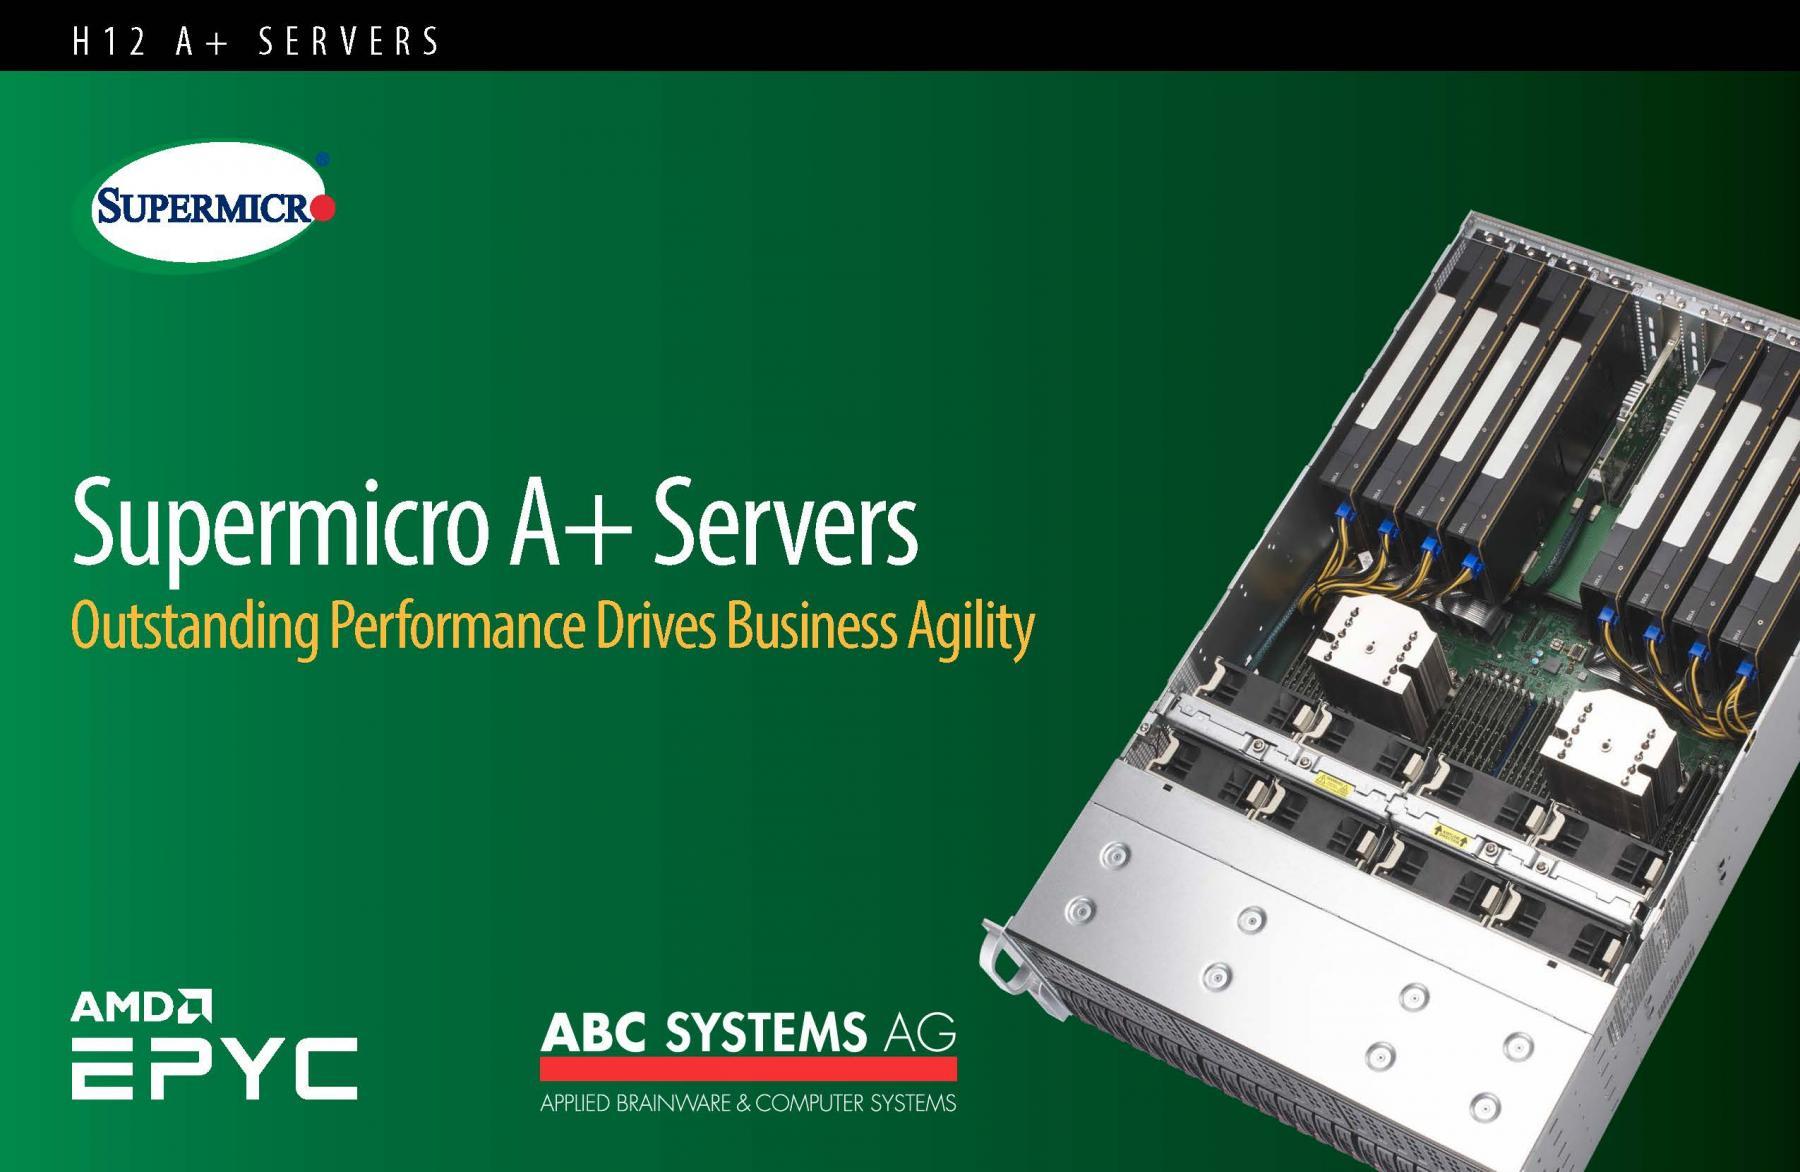 SMC AMD Server ABC 1